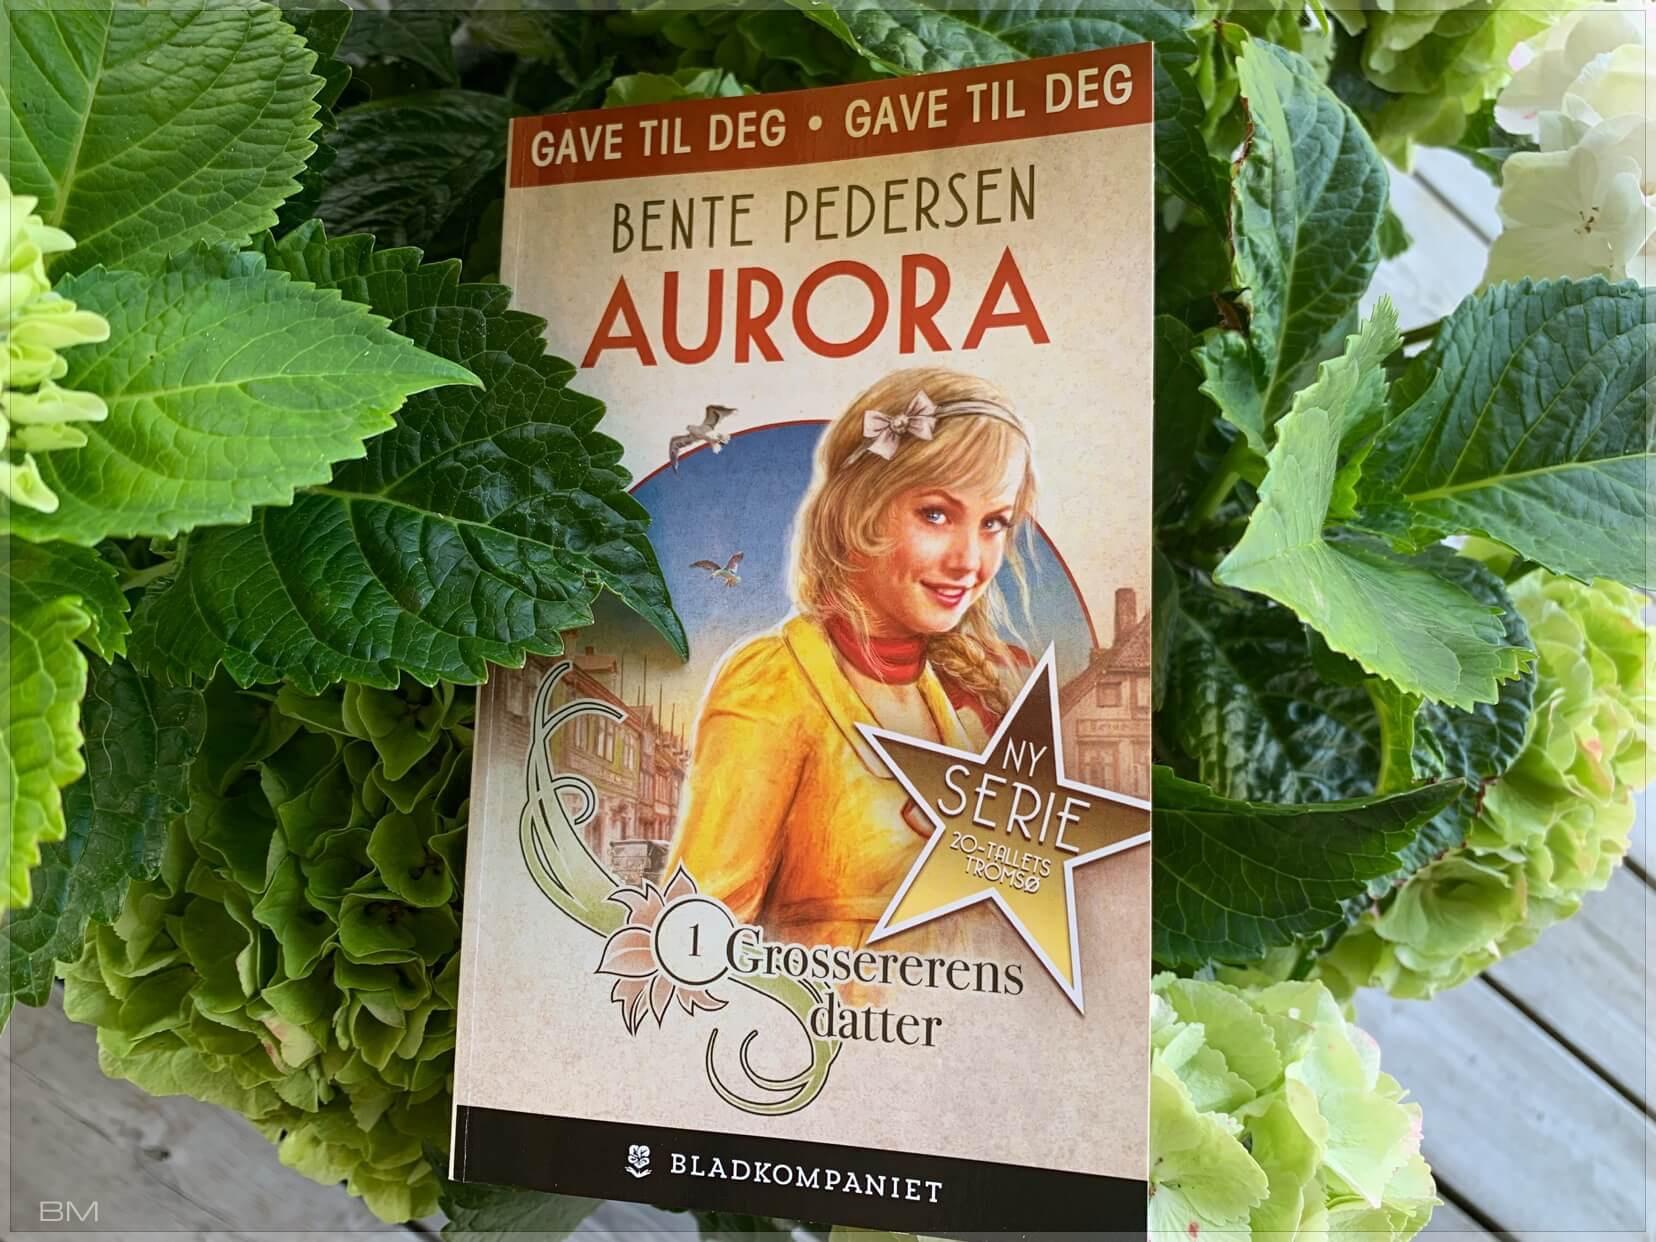 Serieromanen Aurora av Bente Pedersen